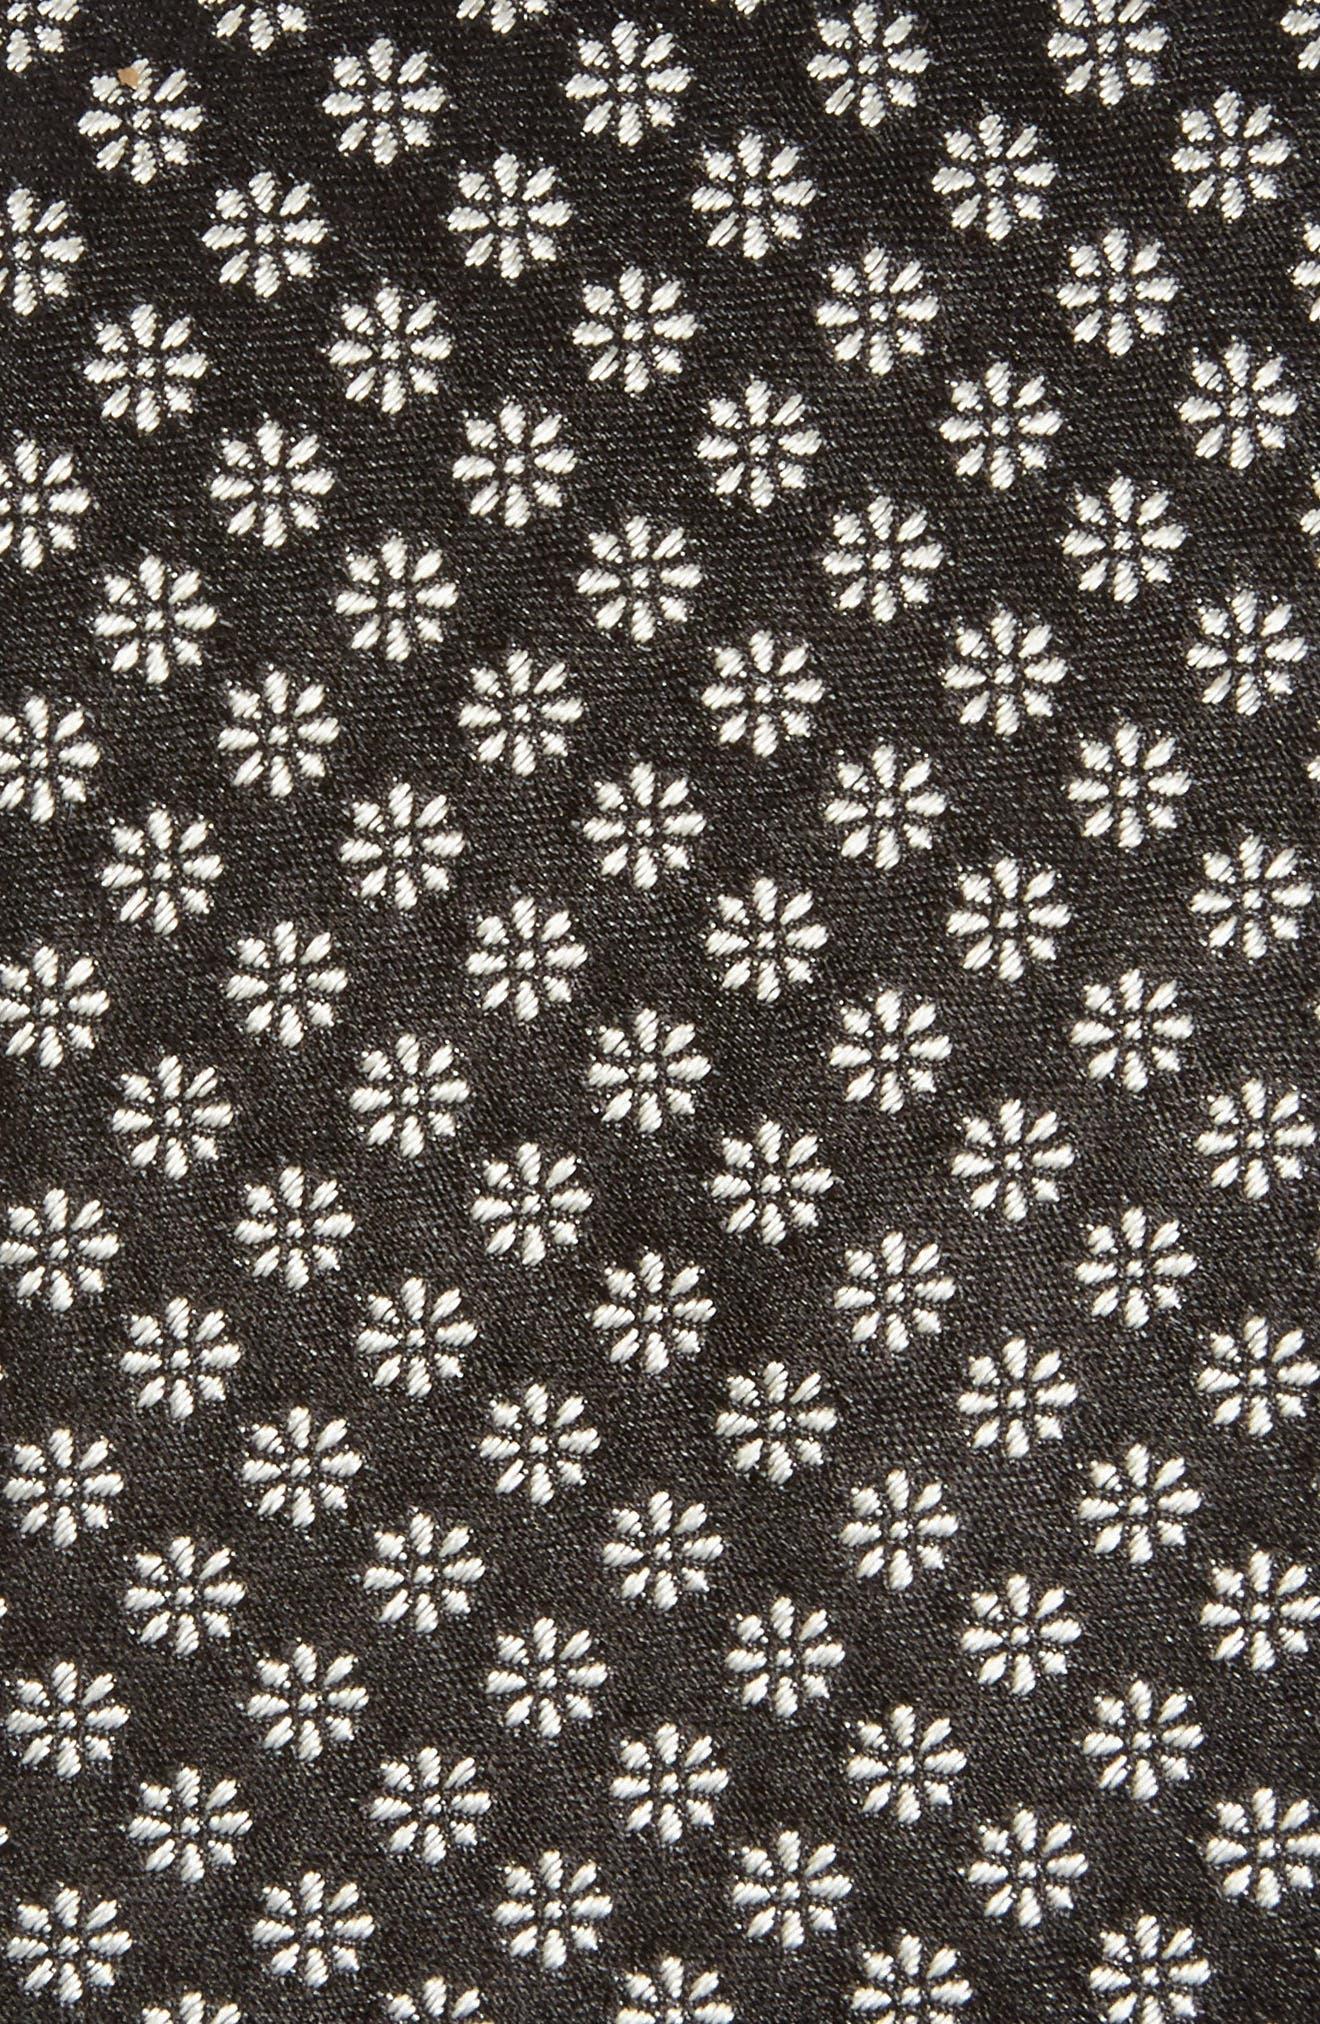 Floral Silk Skinny Tie,                             Alternate thumbnail 2, color,                             Navy